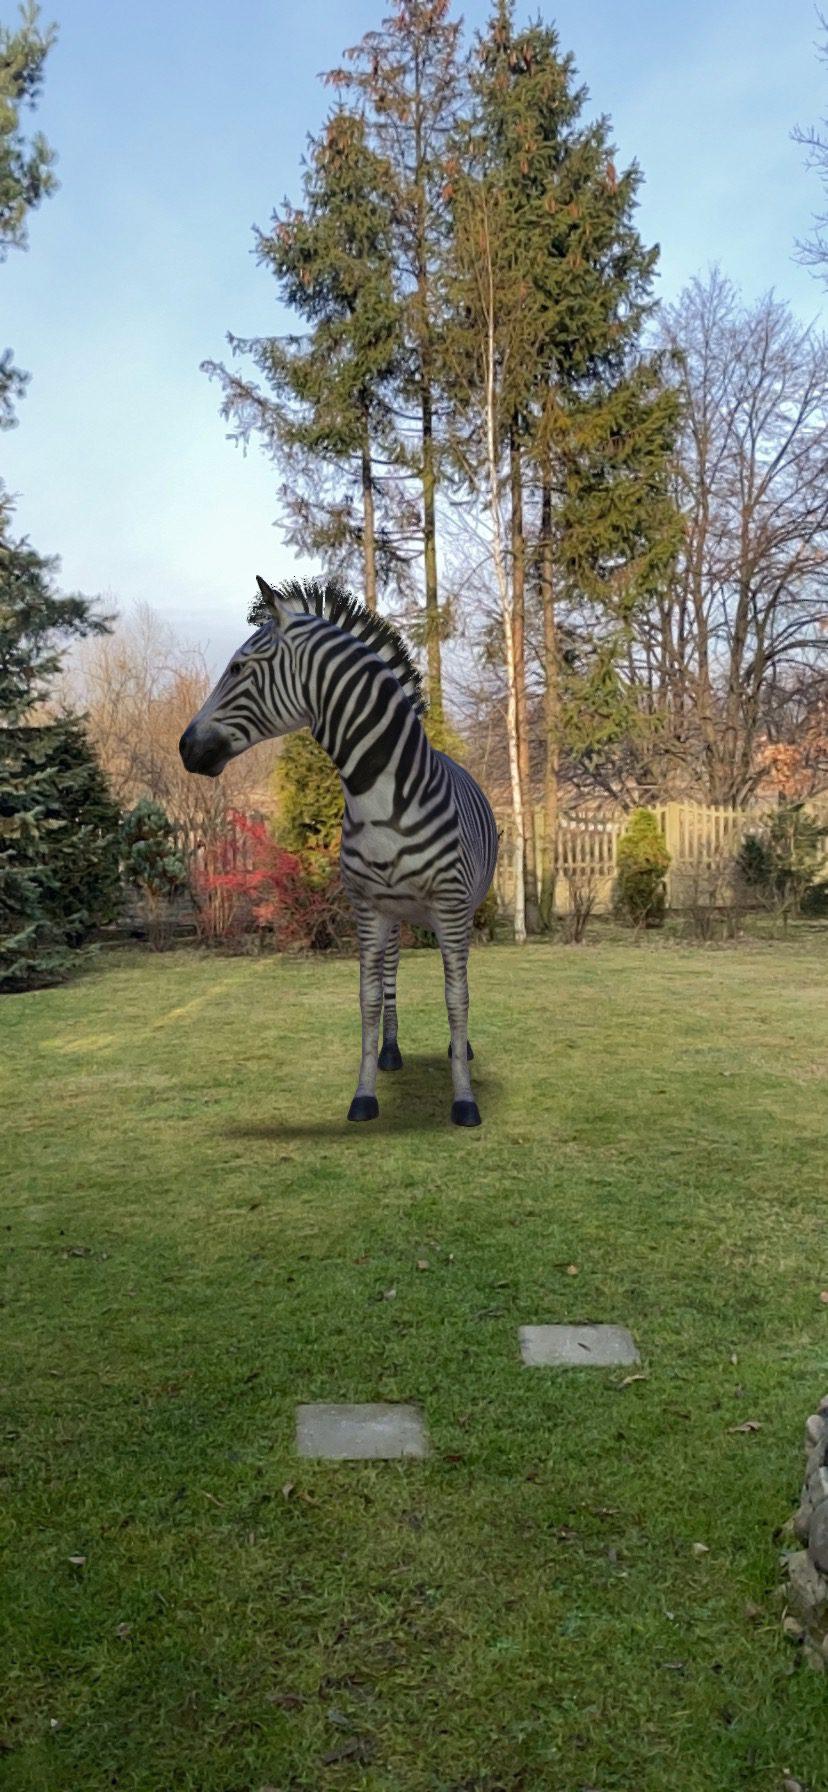 zebra AR Google